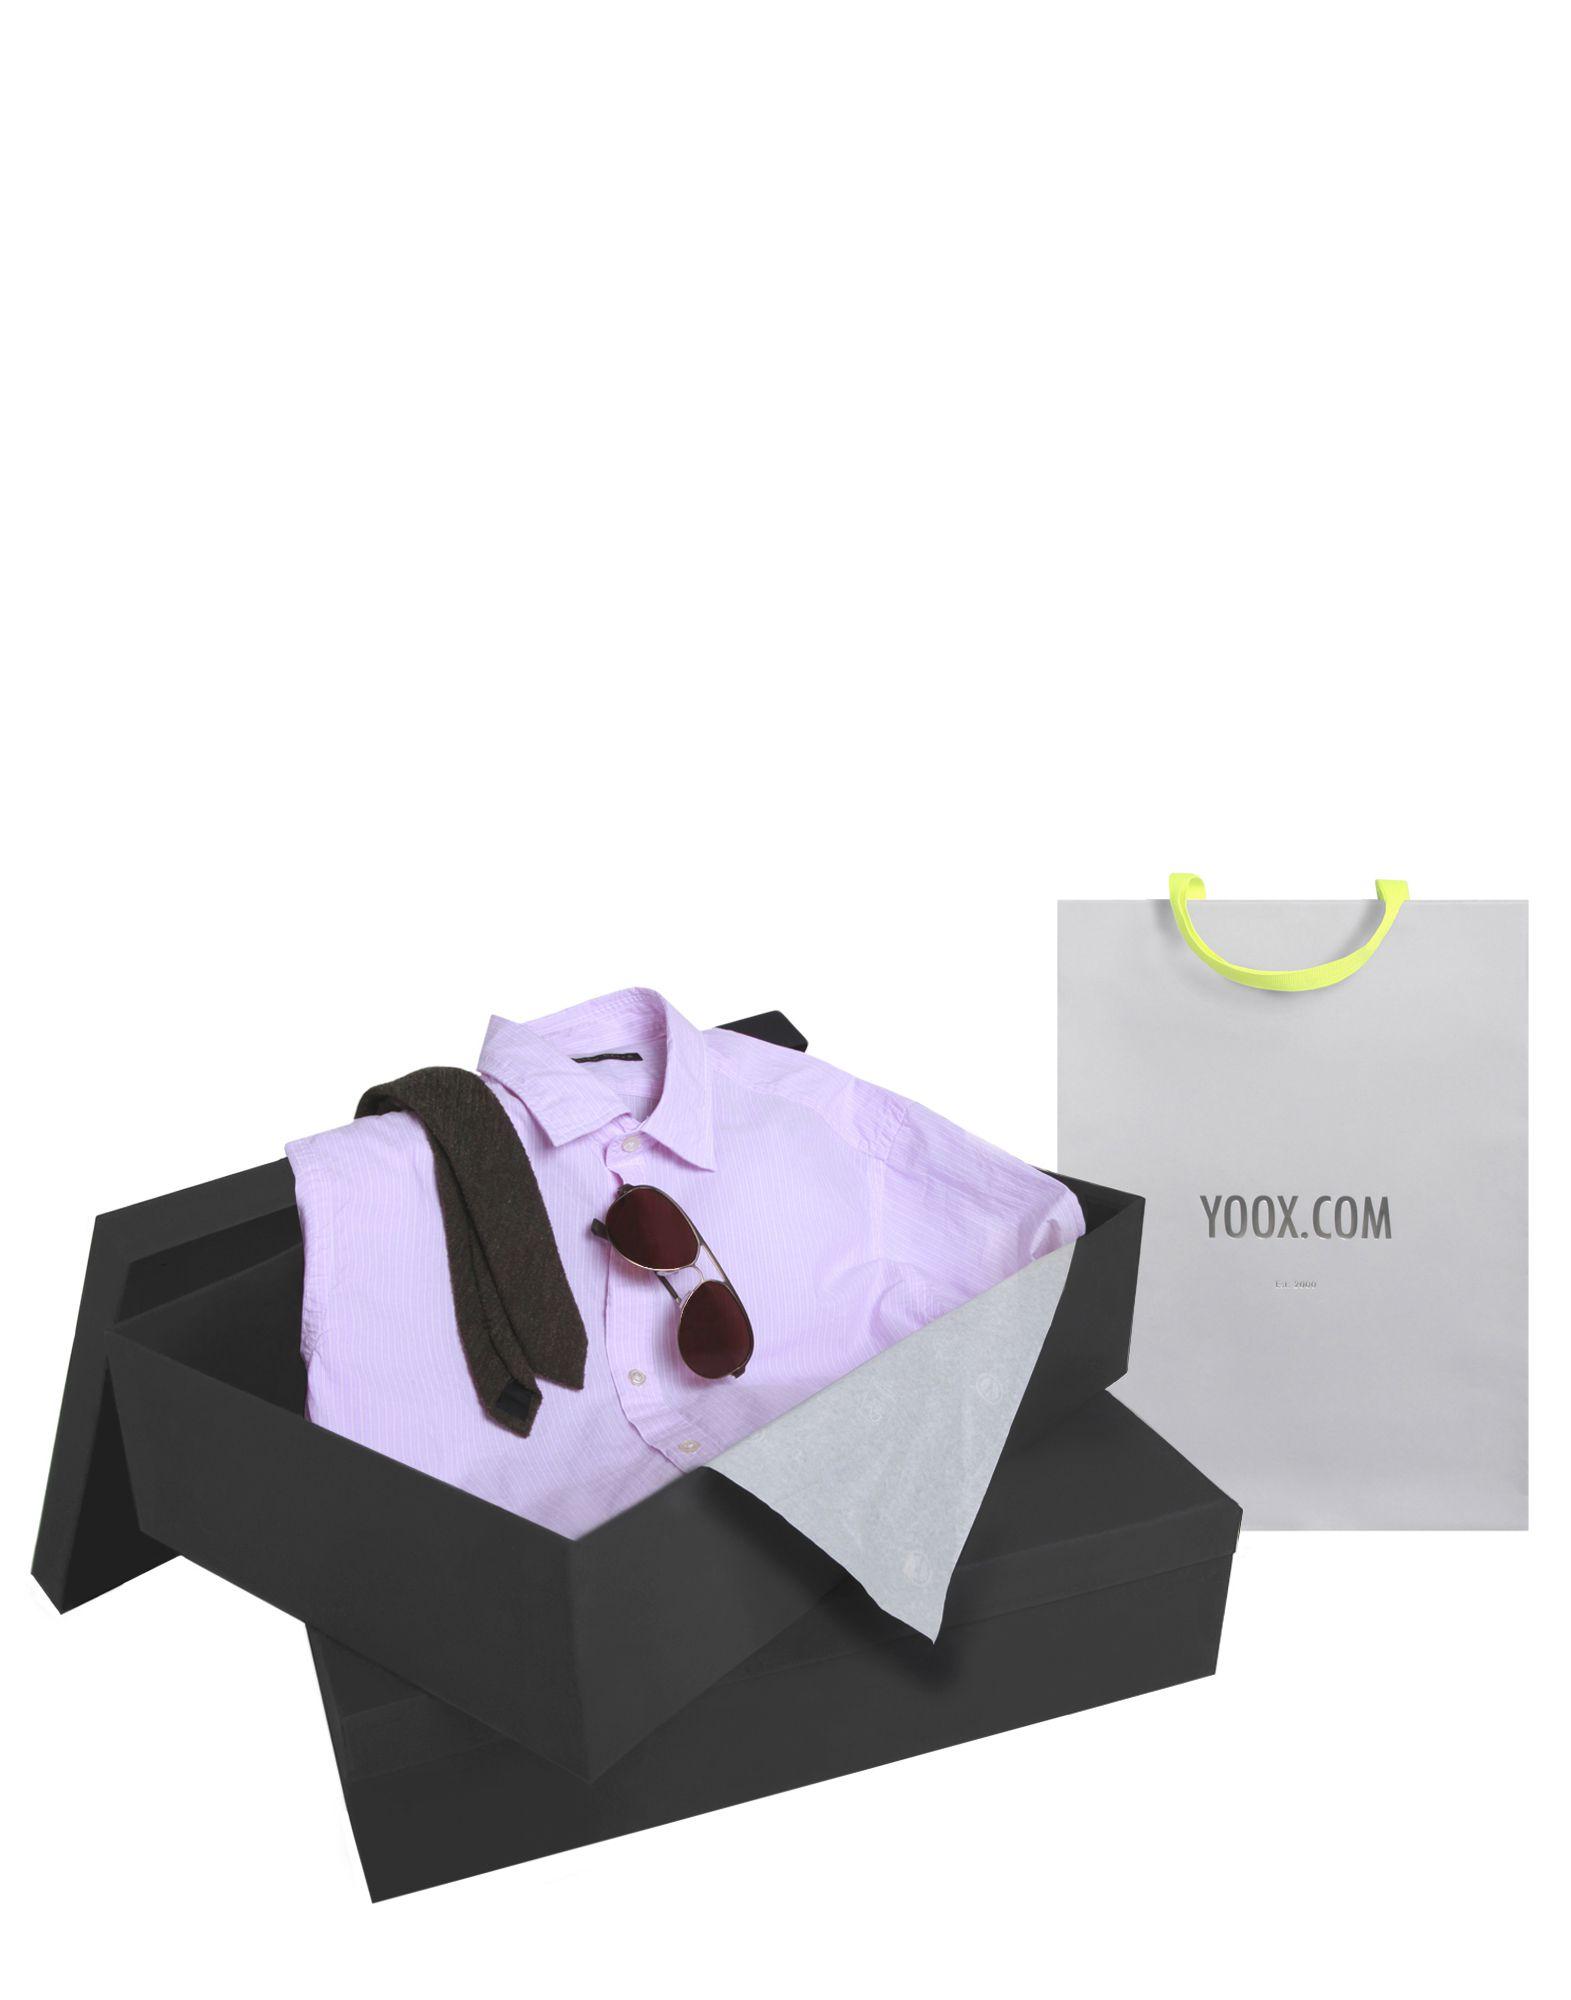 Luckyoox Yoox Gift Box